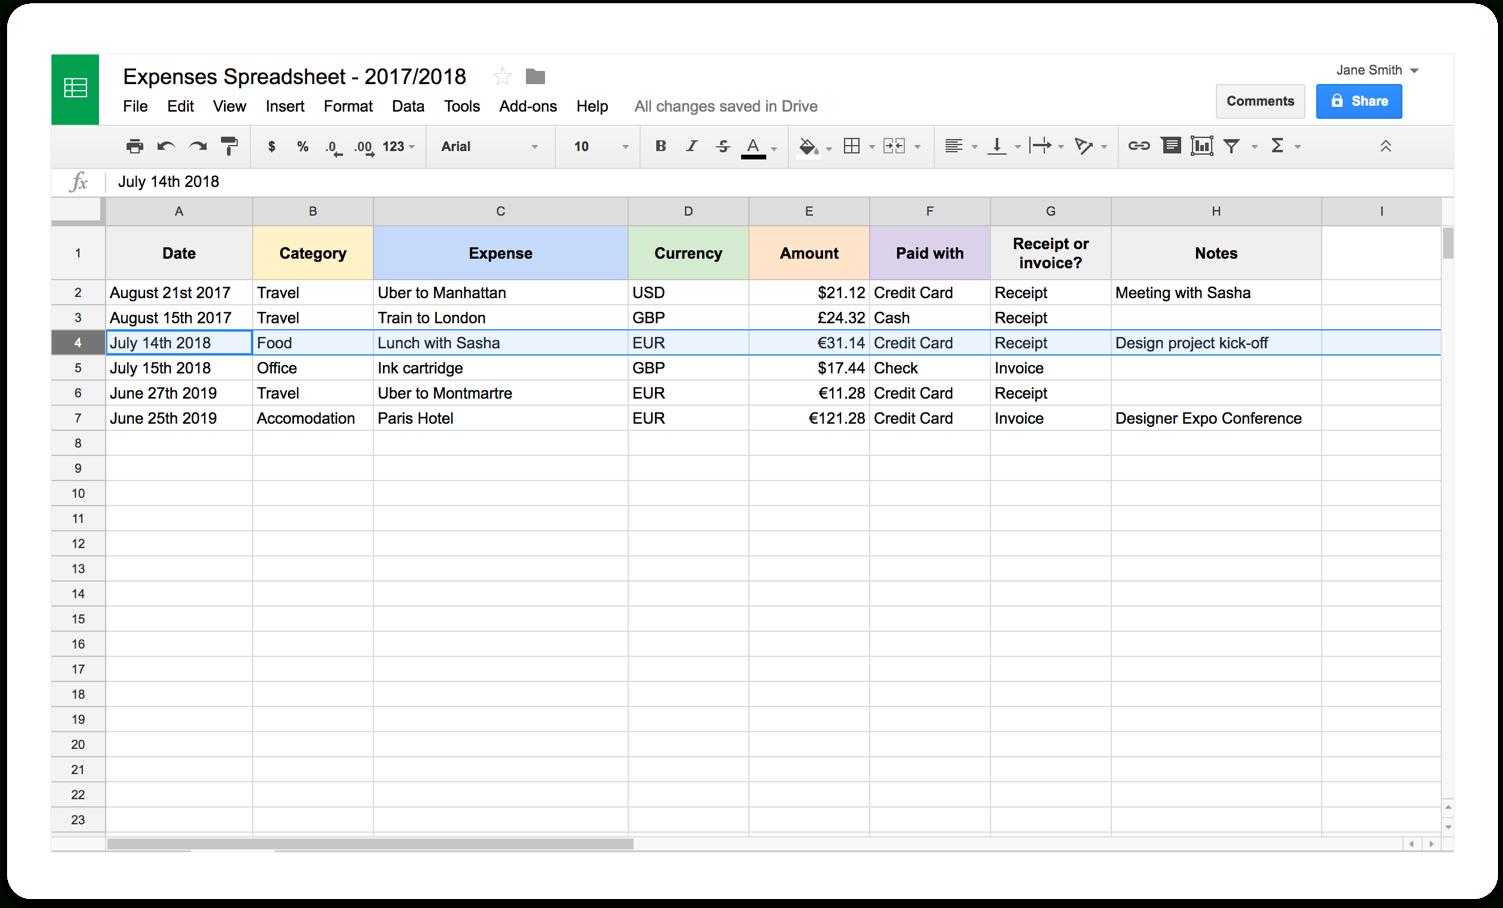 Self Employed Spreadsheet For Accounting Free Within Selfemployed Expenses Spreadsheet